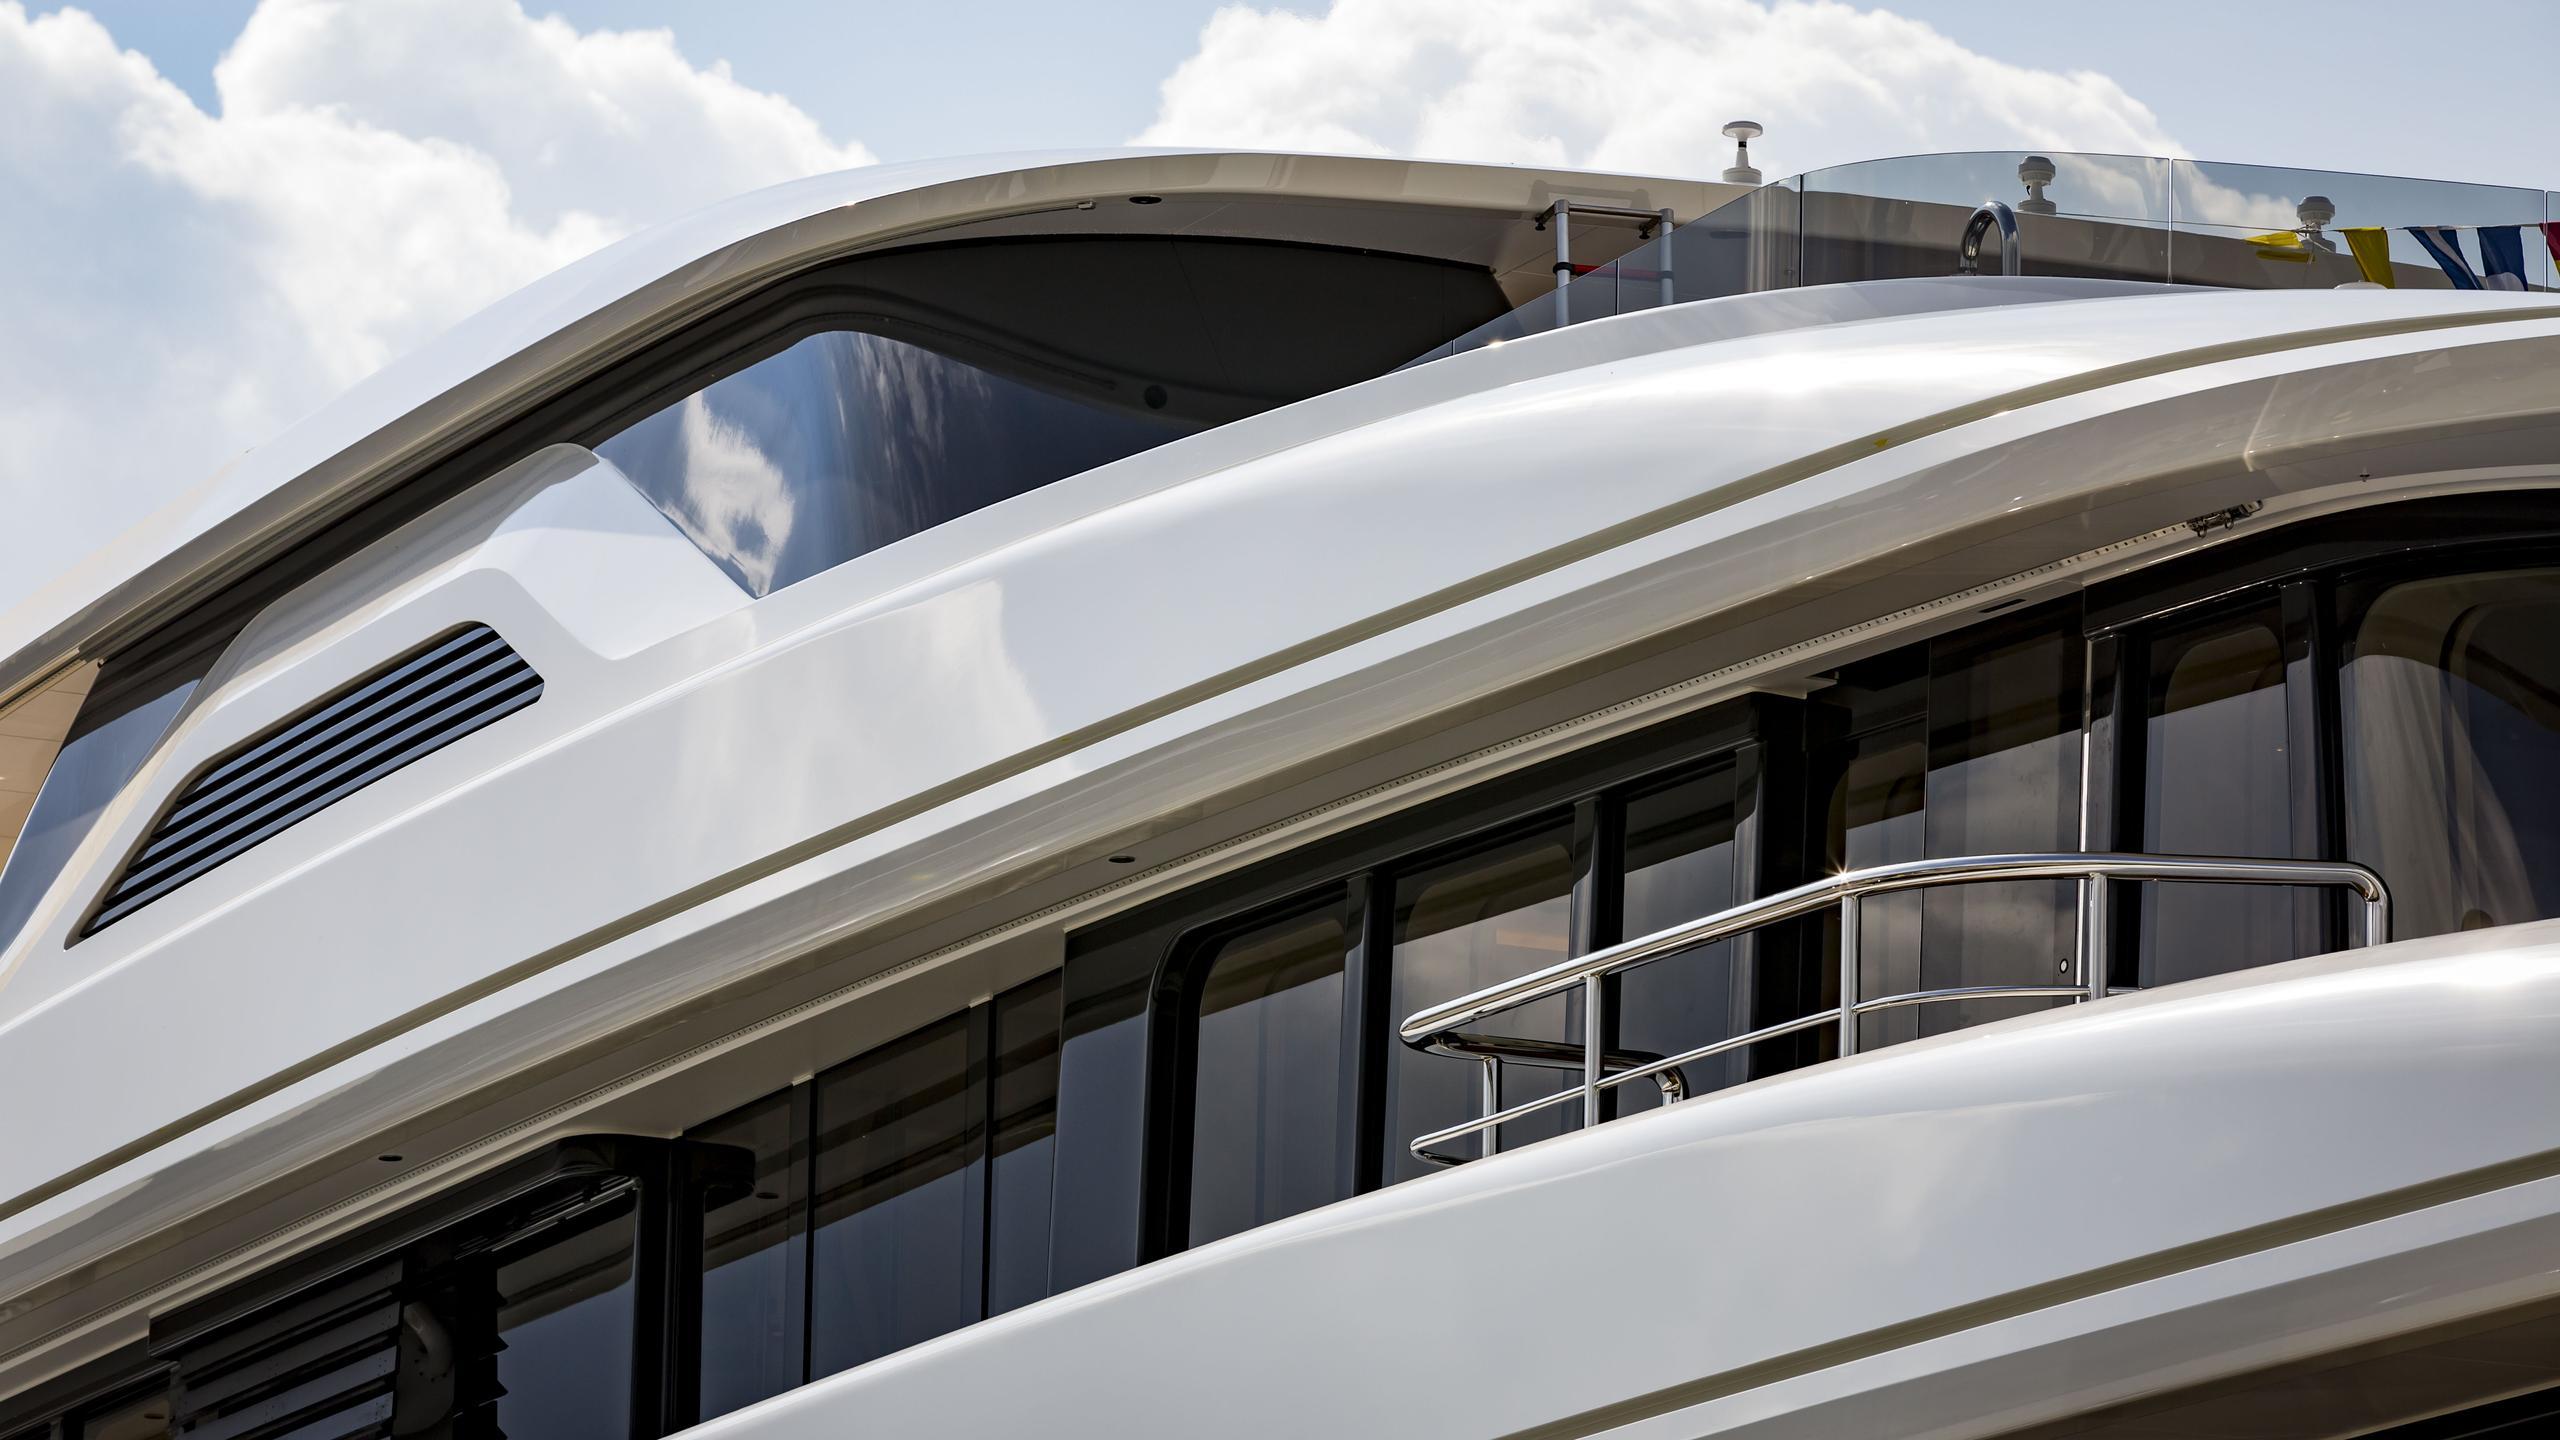 aquarius motoryacht feadship 2016 92m upper deck details